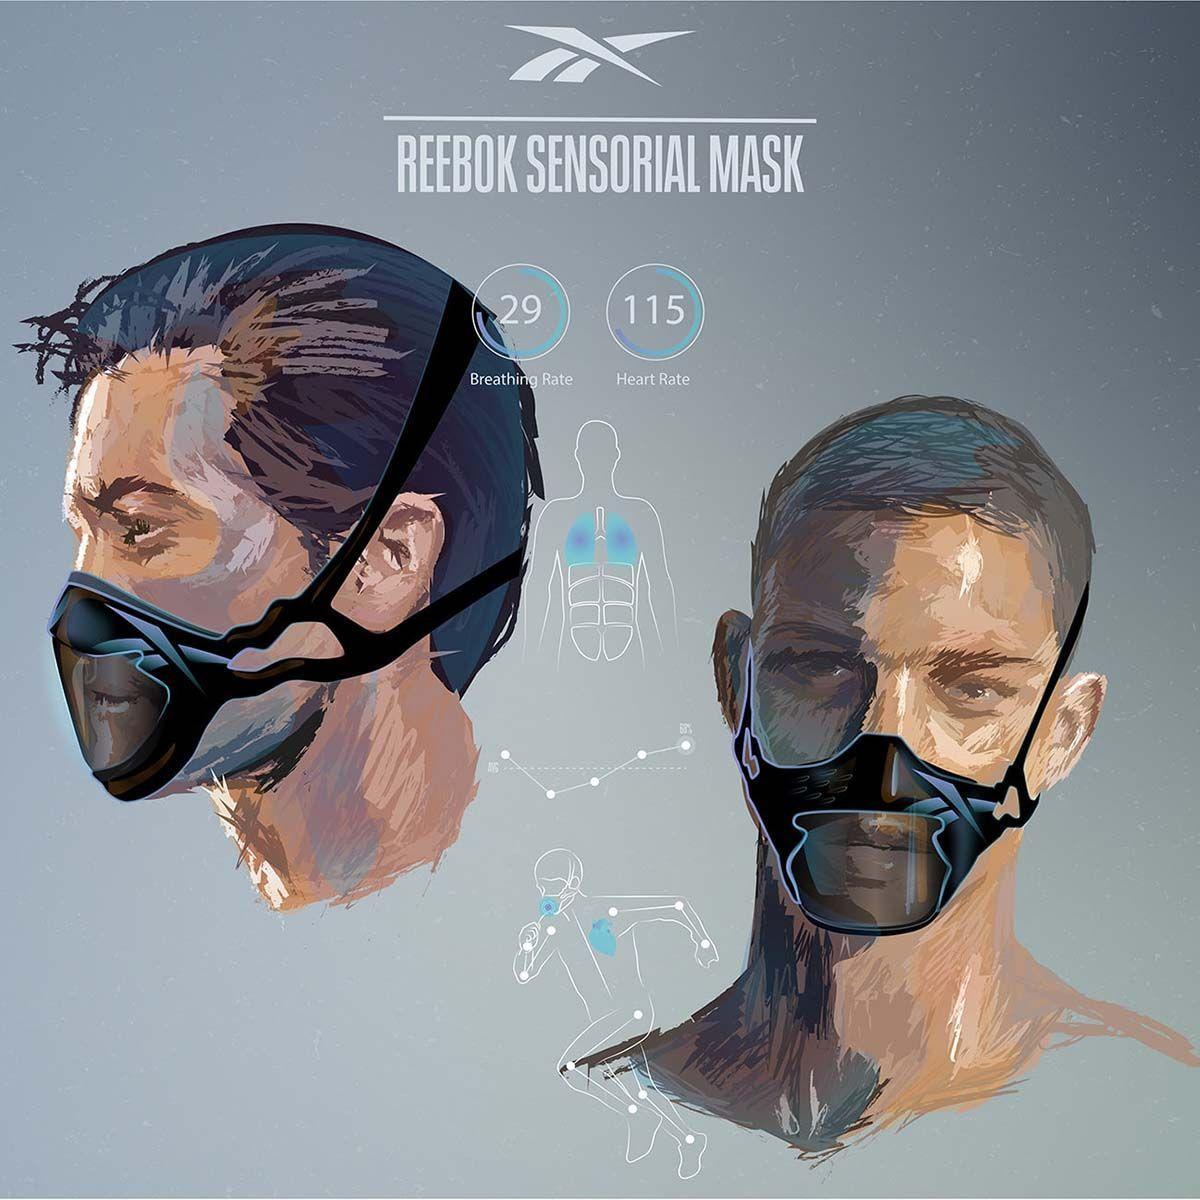 Mascarilla sensorial de Reebok